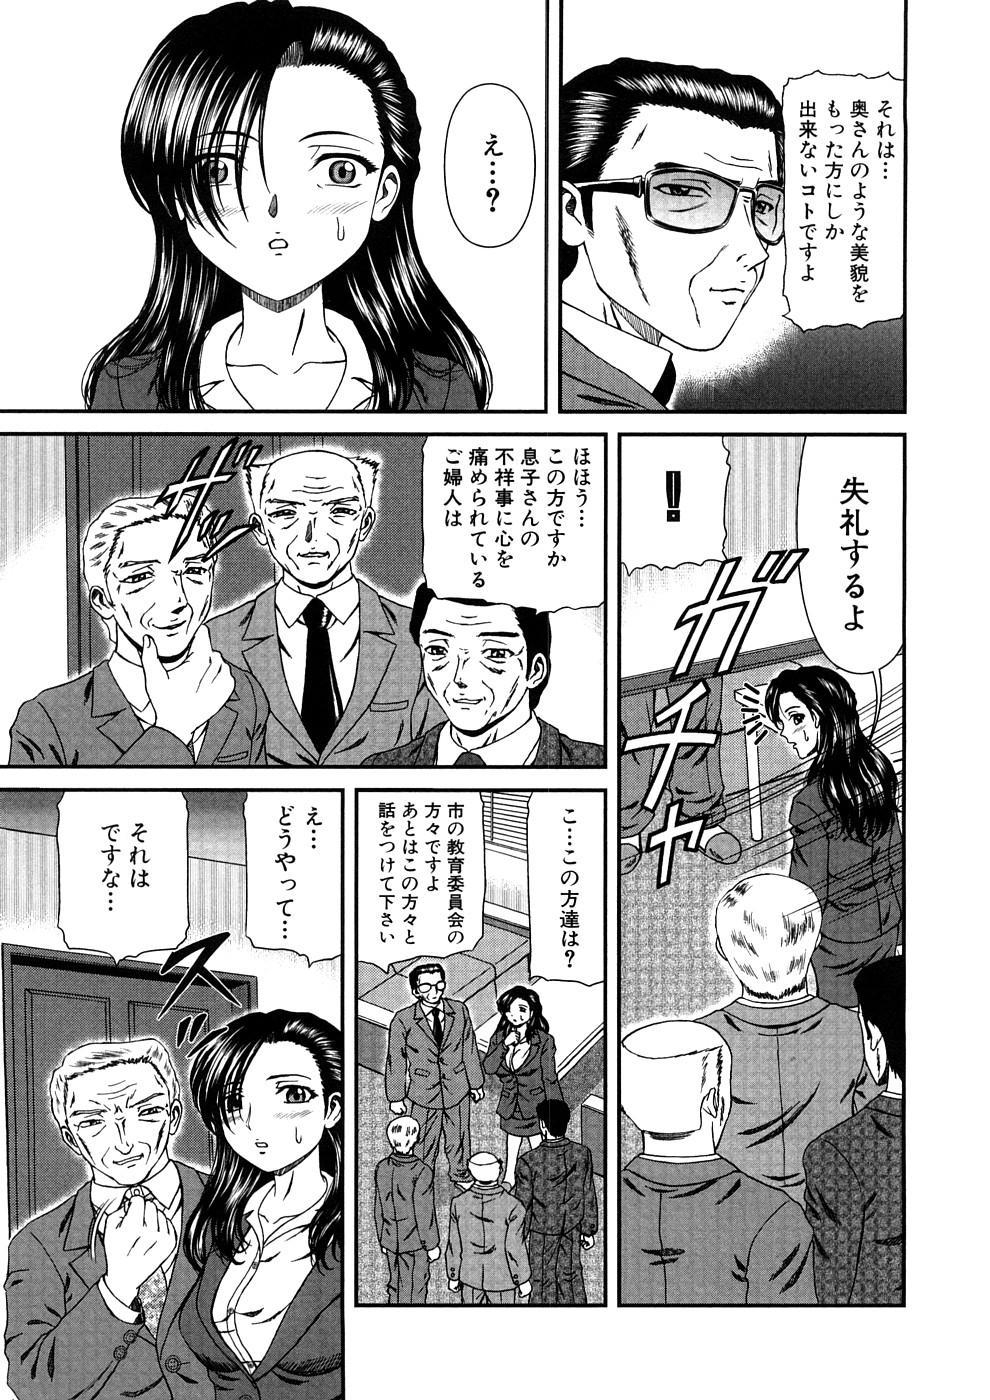 Geki Yaba Anthology Vol. 1 - Naka ni Dashite yo 143